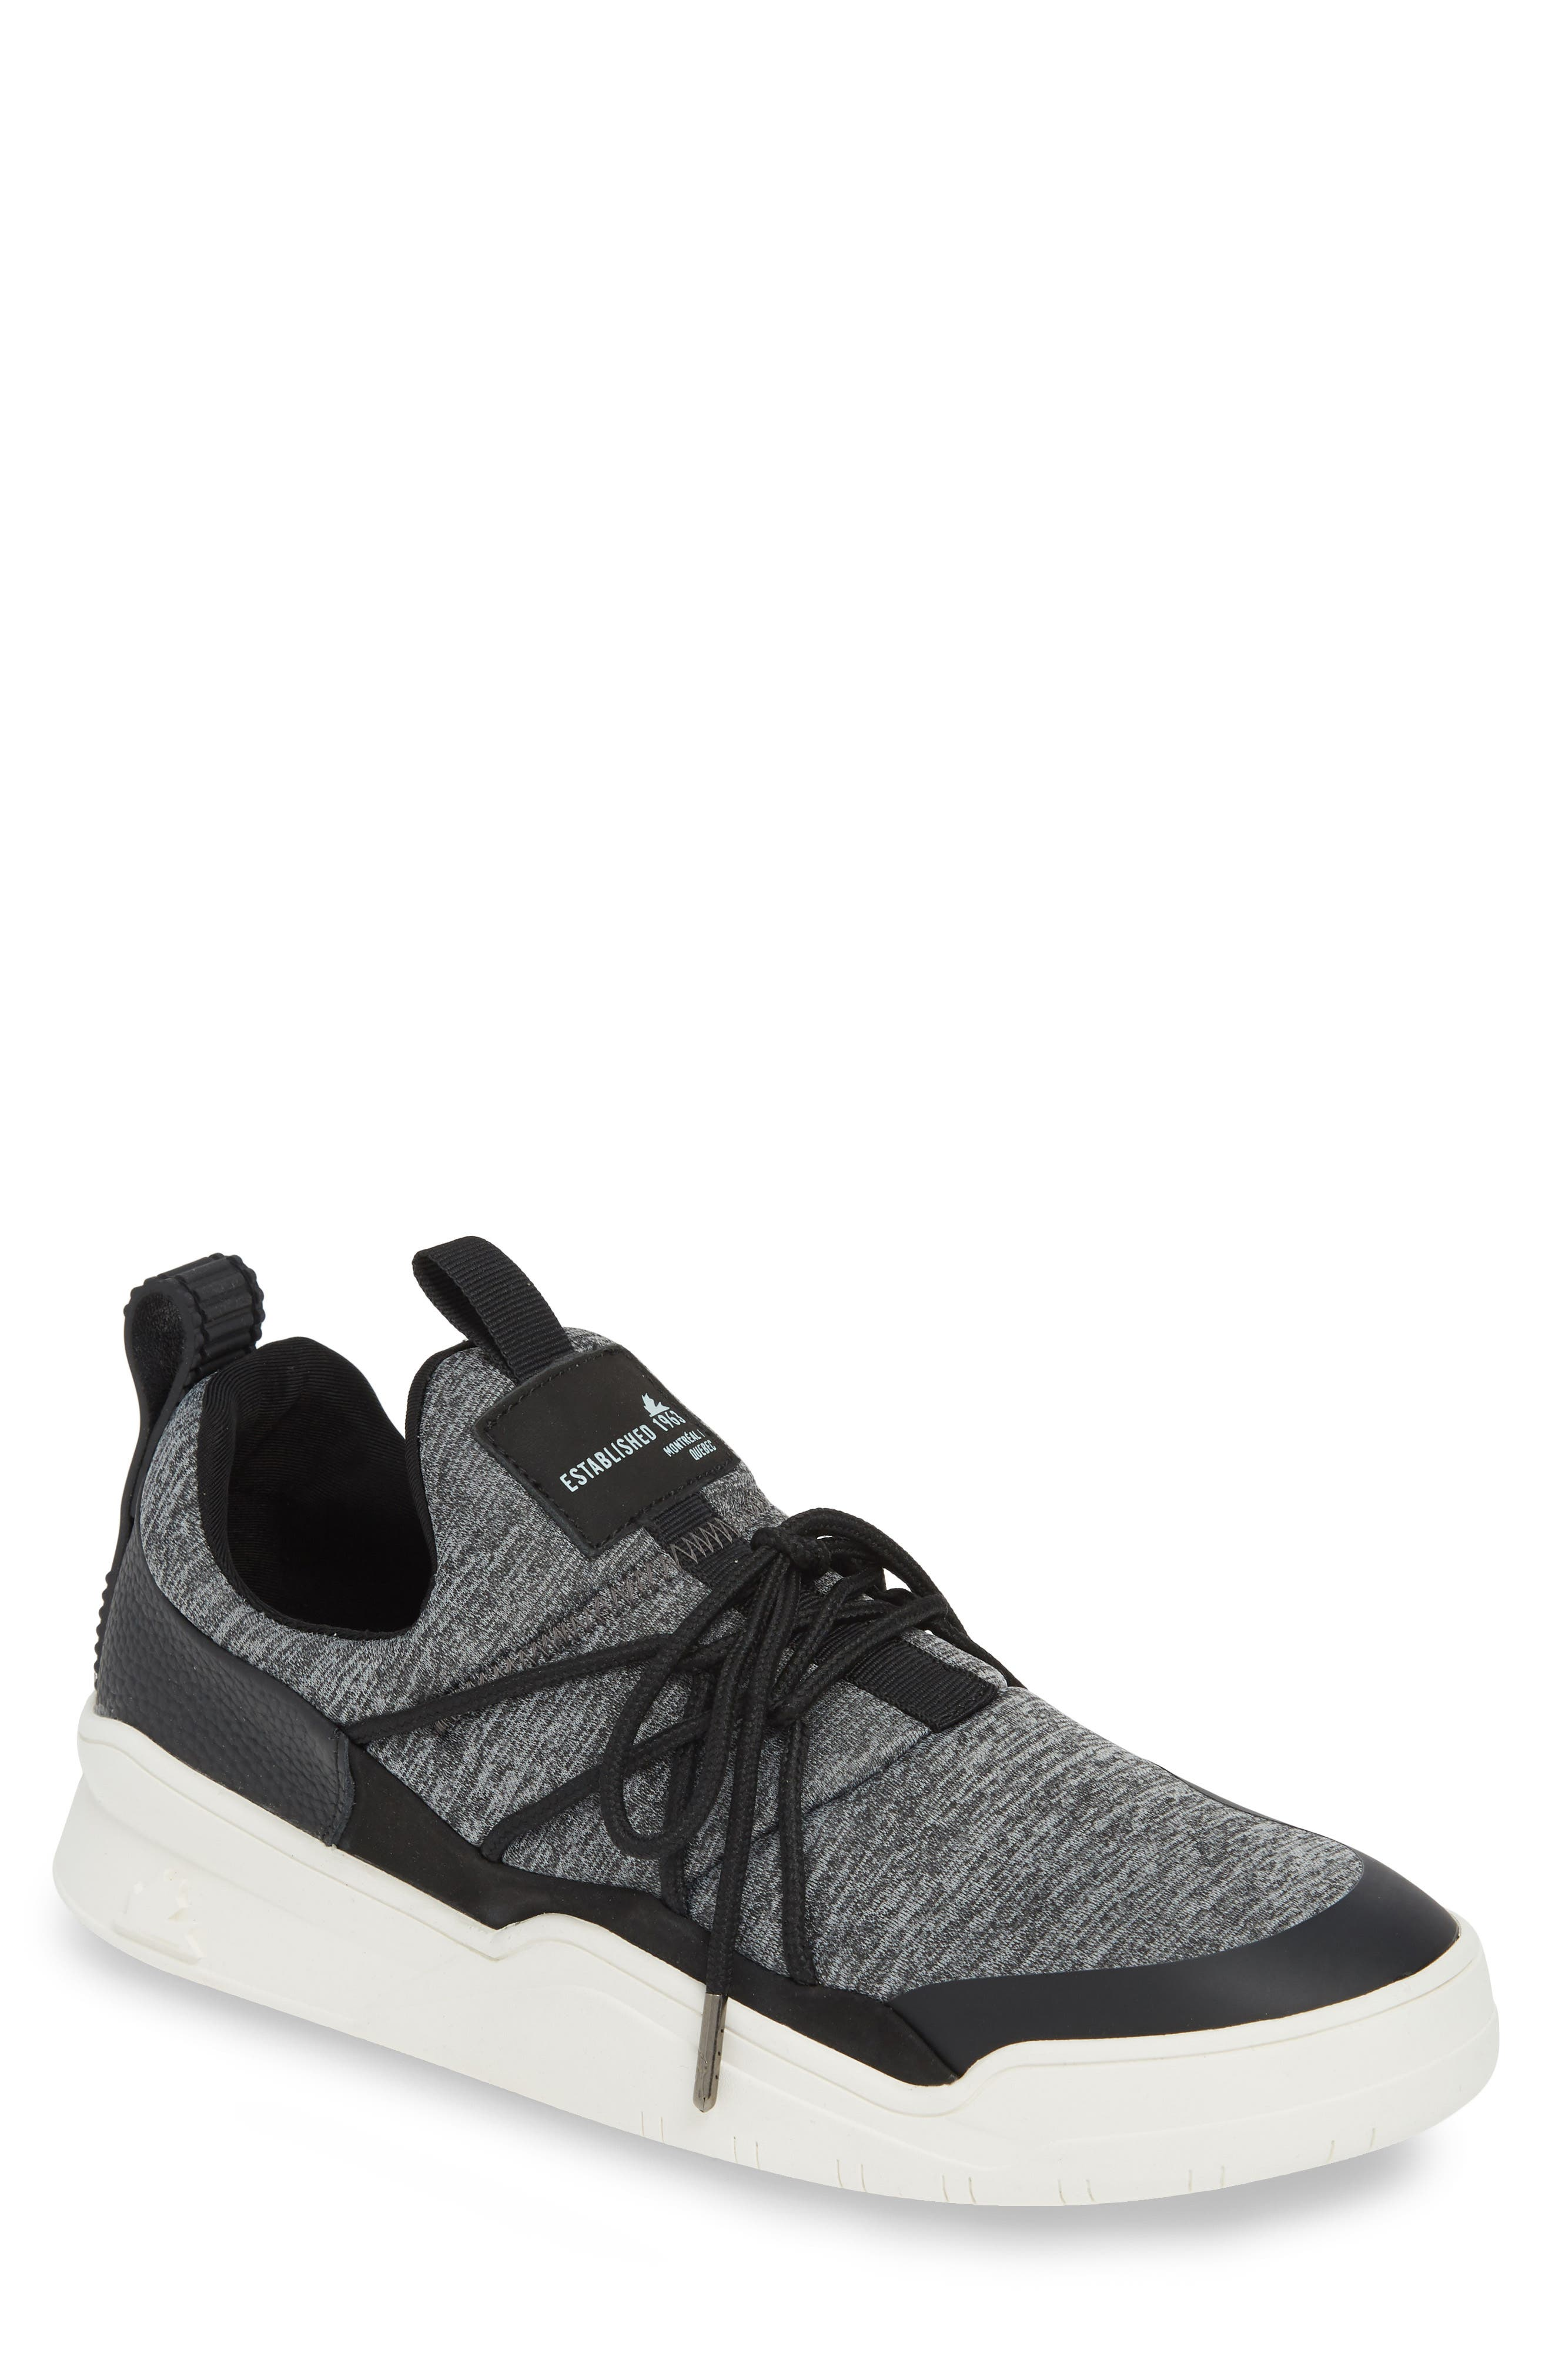 Pajar Pace Sneaker, Grey